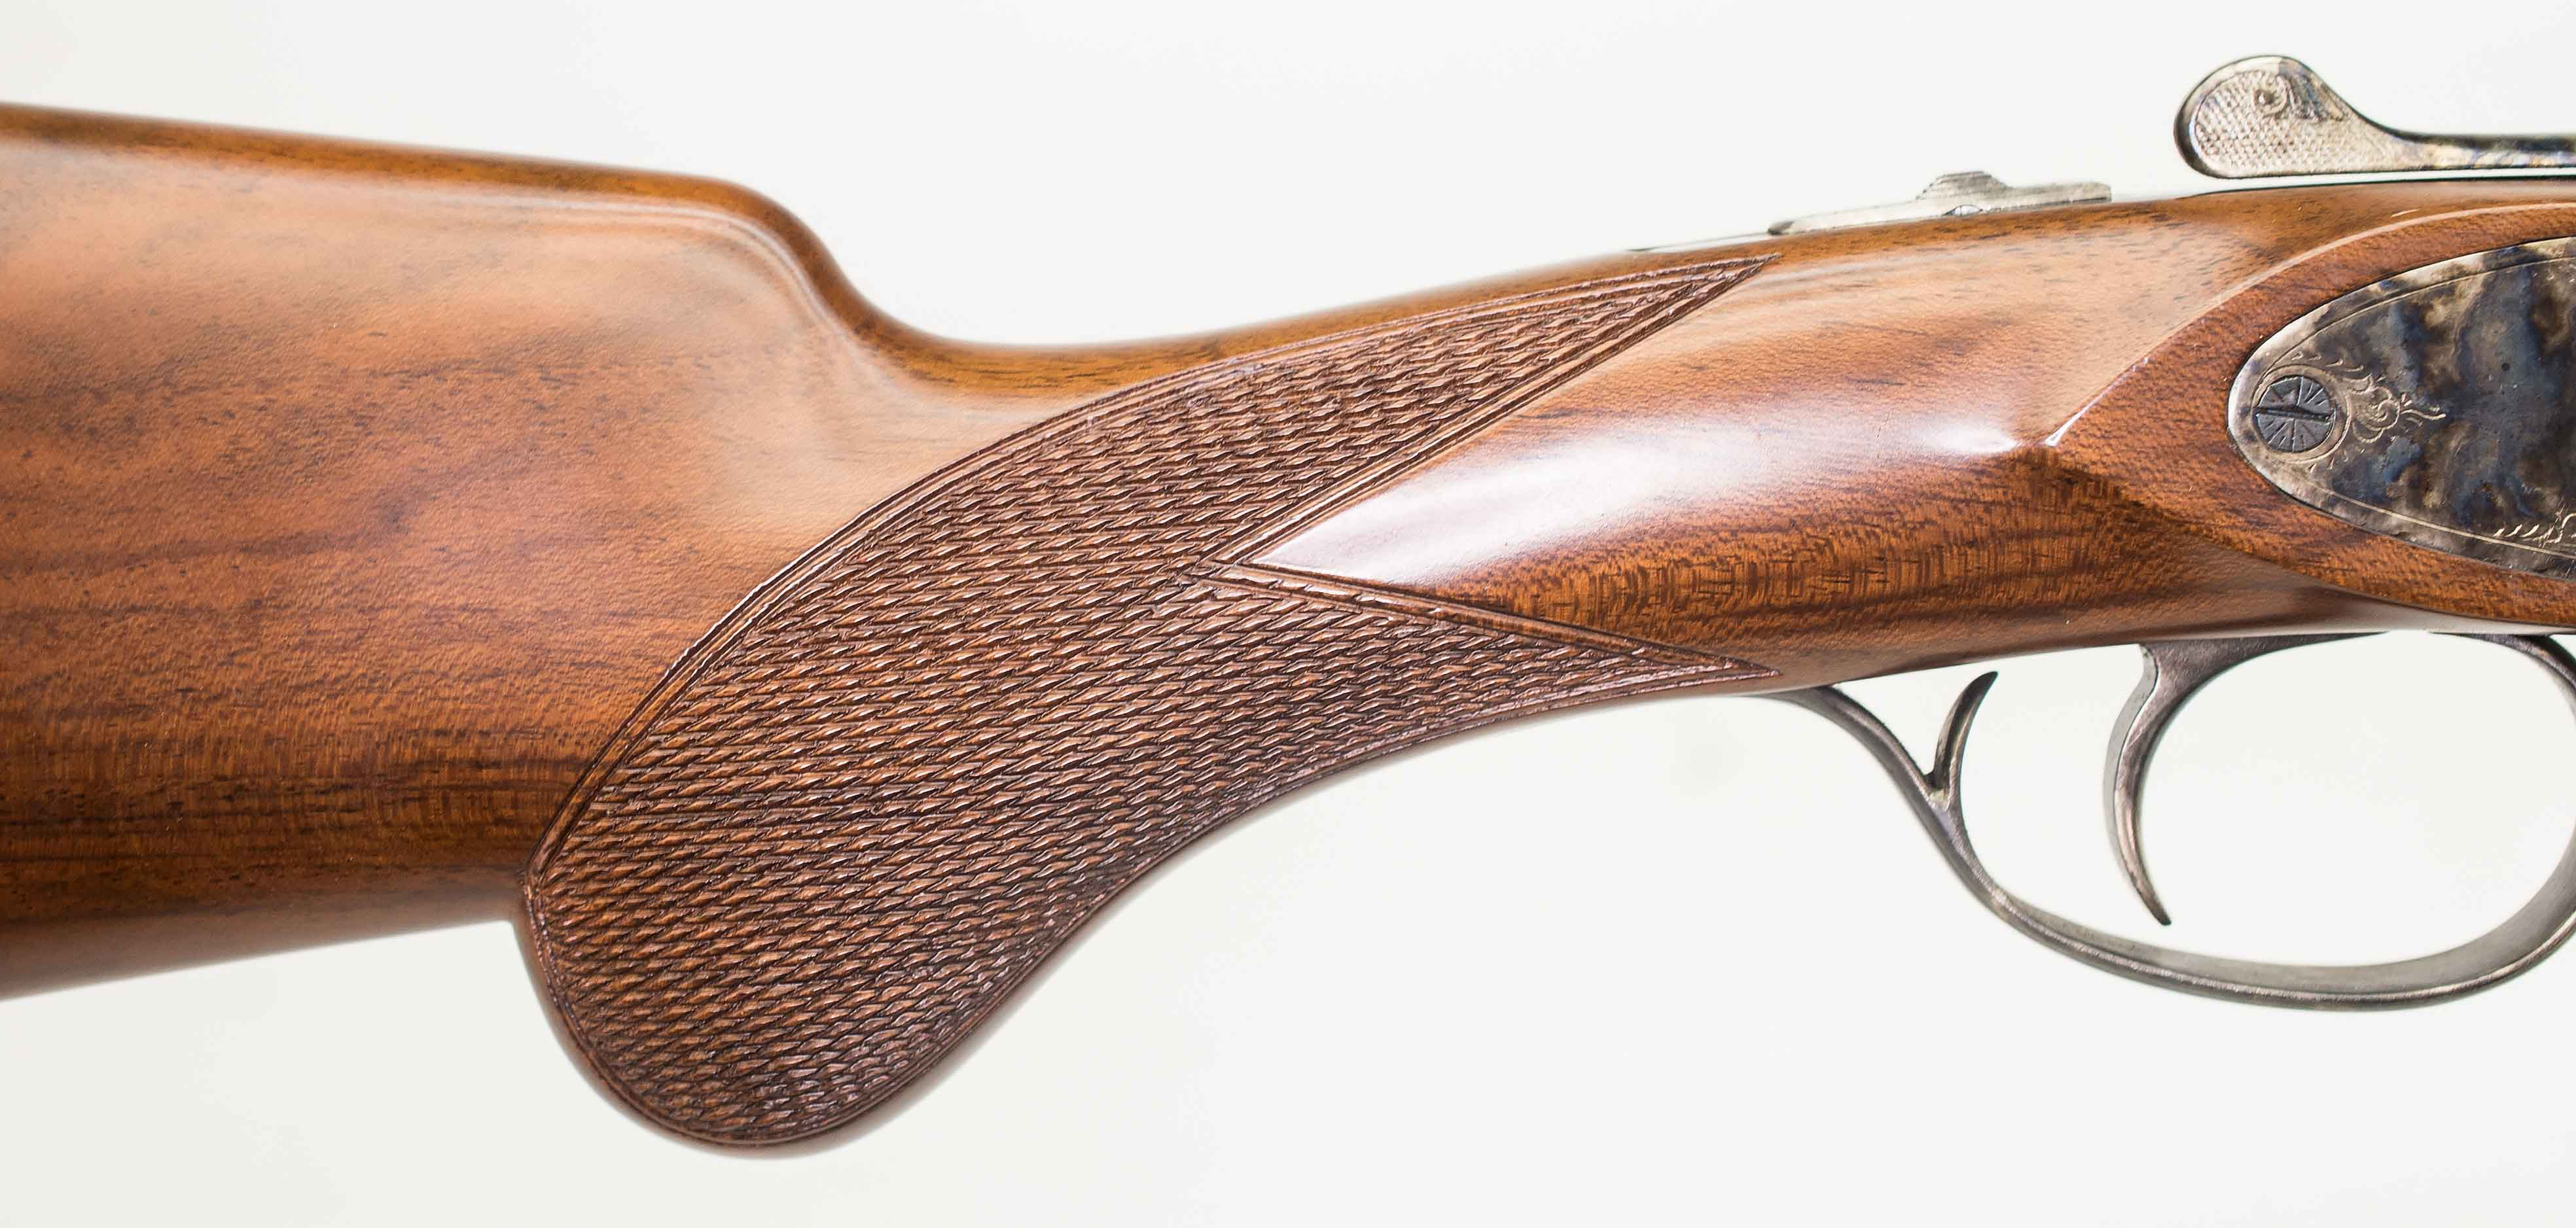 CZ HUGLU – 410 GAUGE (Auction ID: 12479926, End Time : Sep